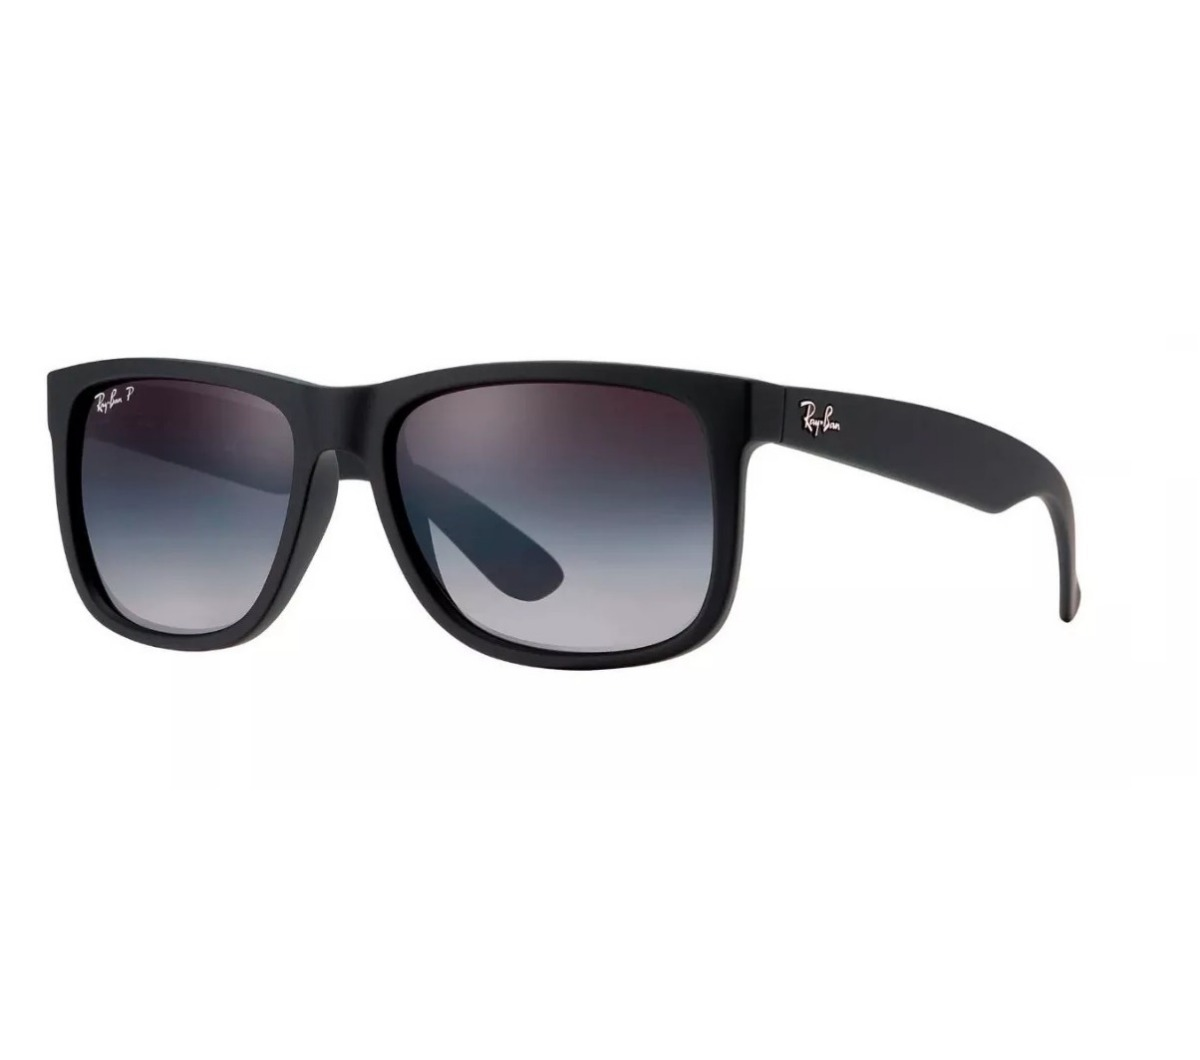 cc503b85a5422 óculos de sol masculino ray ban justin rb4165 black friday. Carregando zoom.